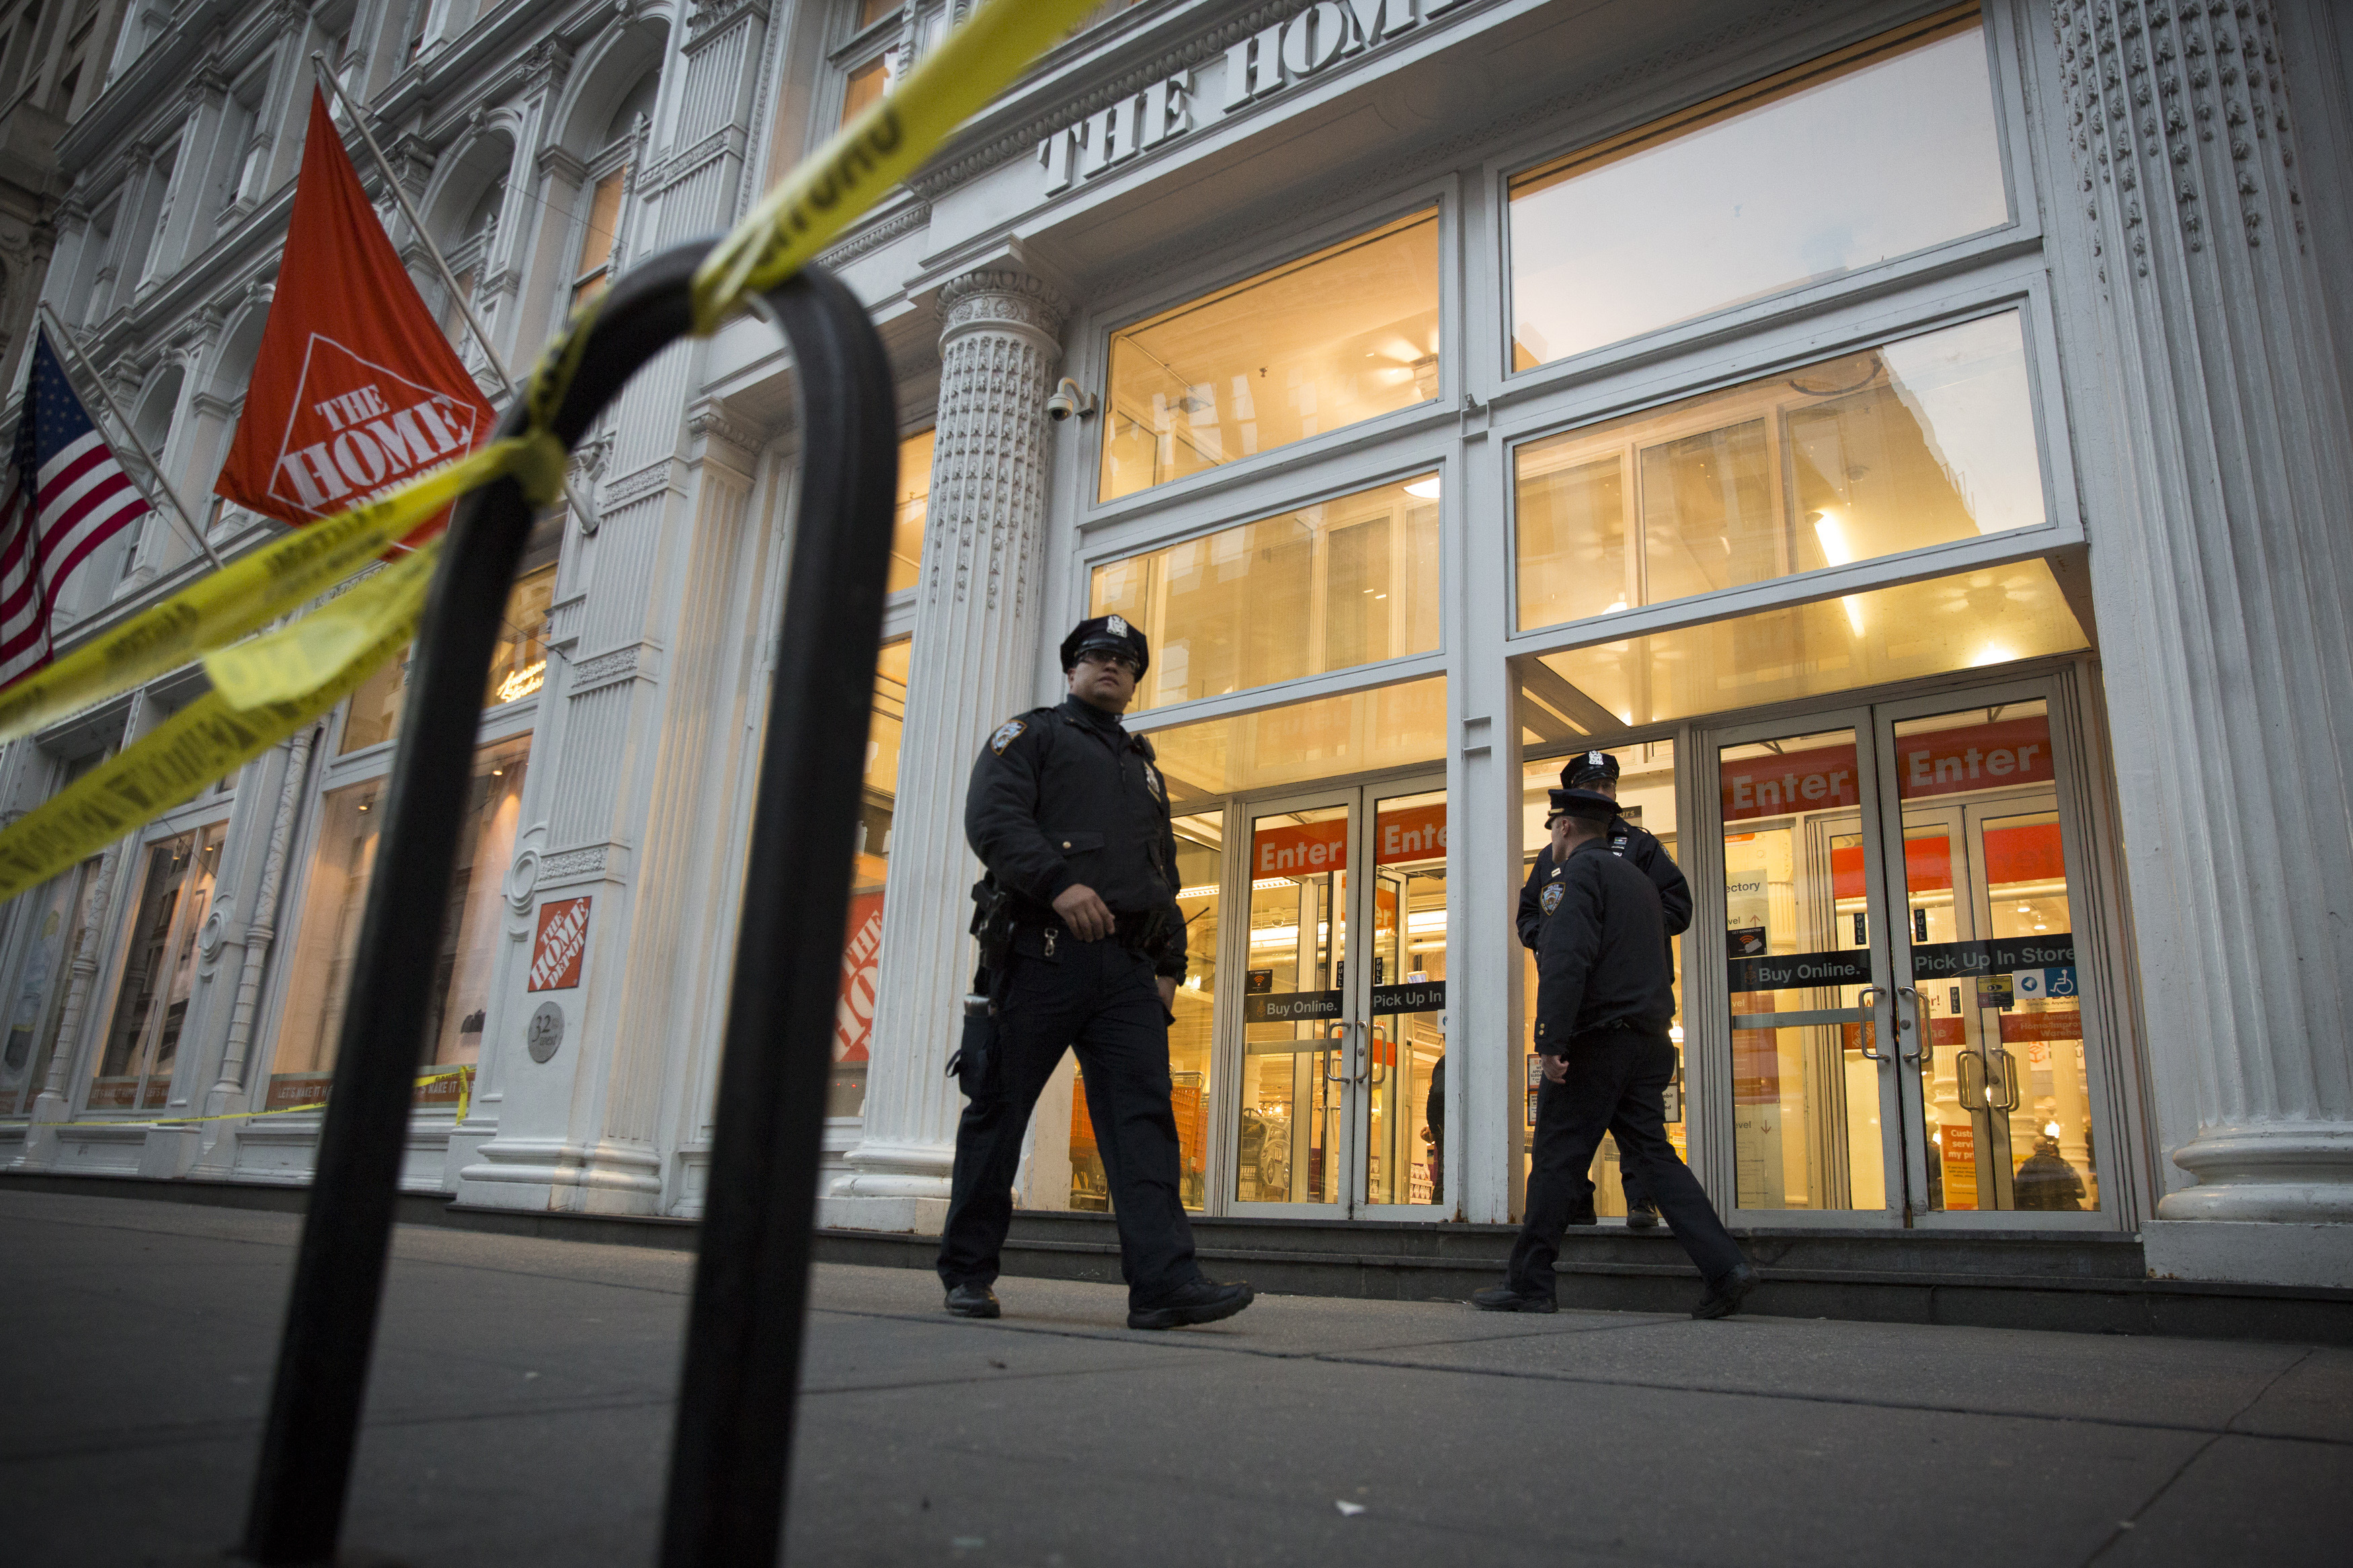 New York Home Depot Shoppers Flee As Employee Fatally